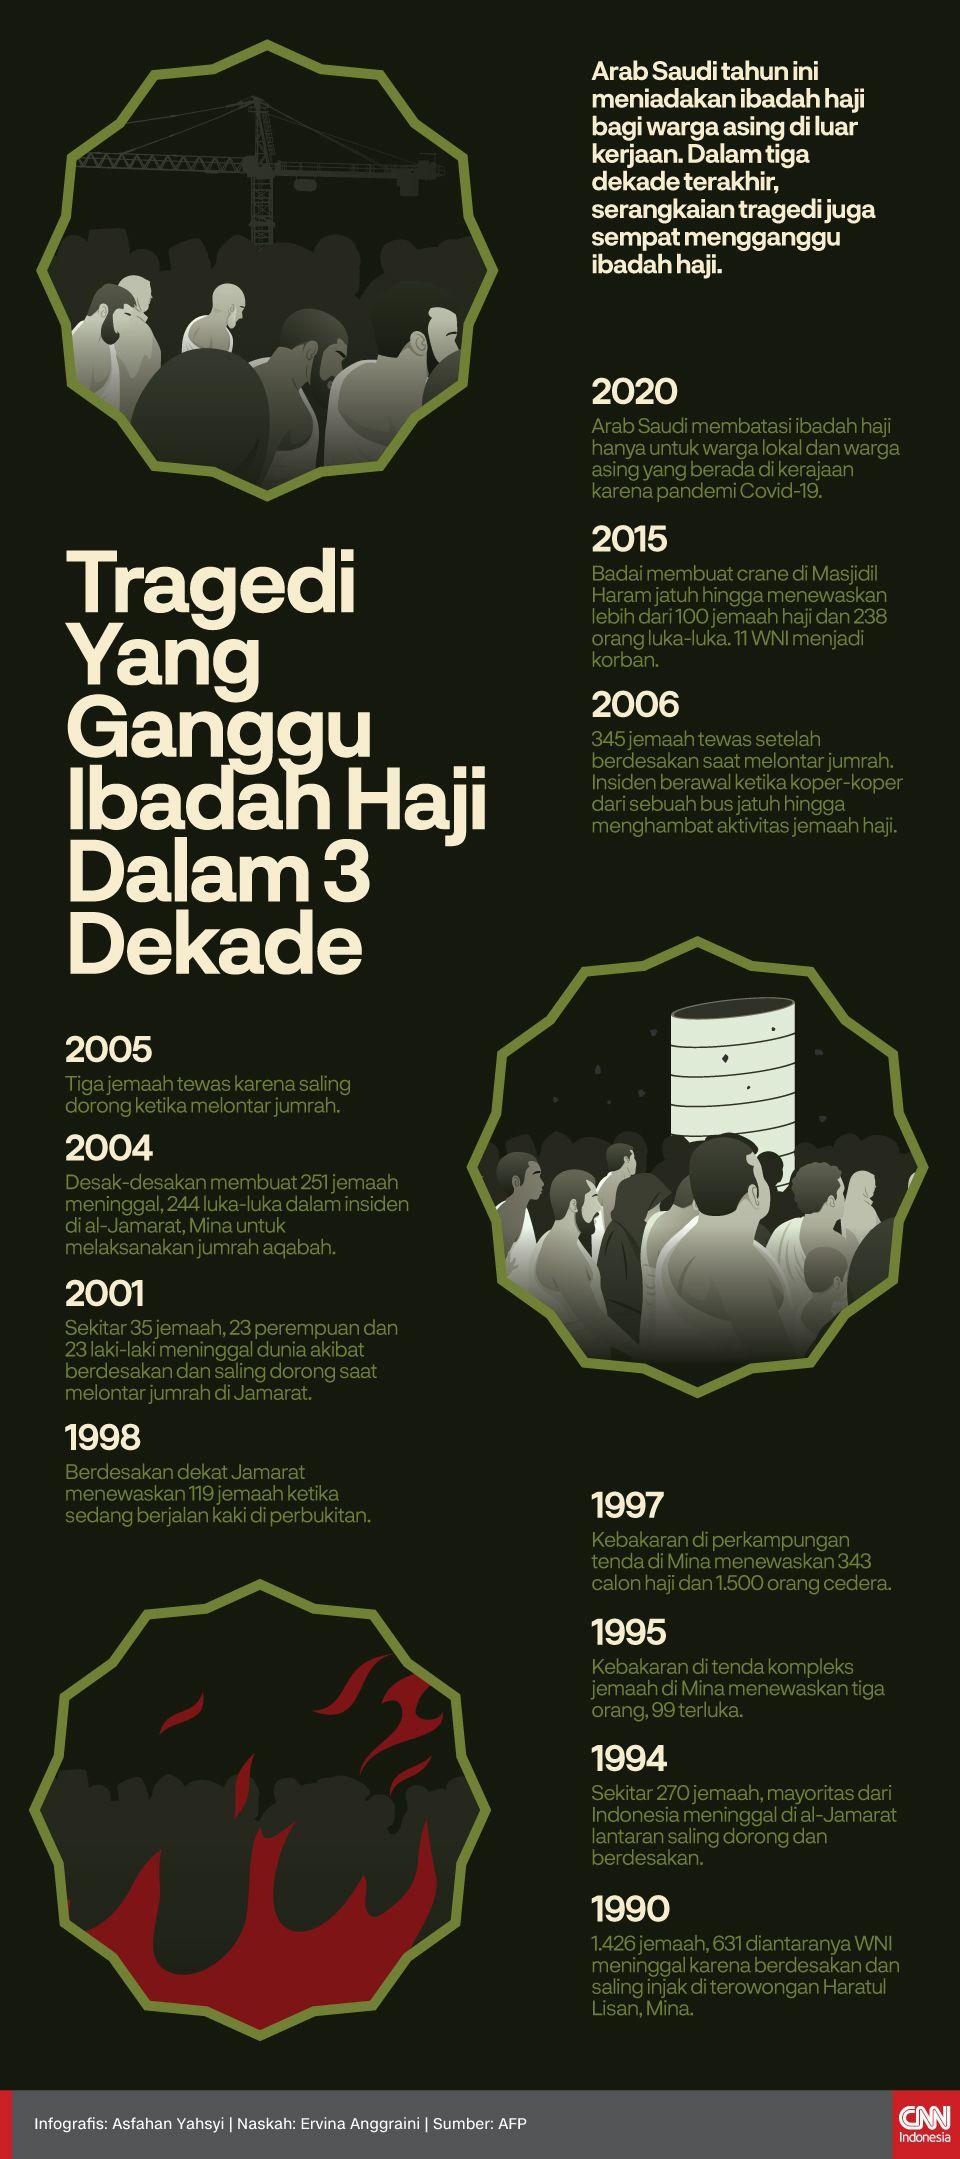 Infografis Tragedi yang Ganggu Ibadah Haji dalam 3 Dekade